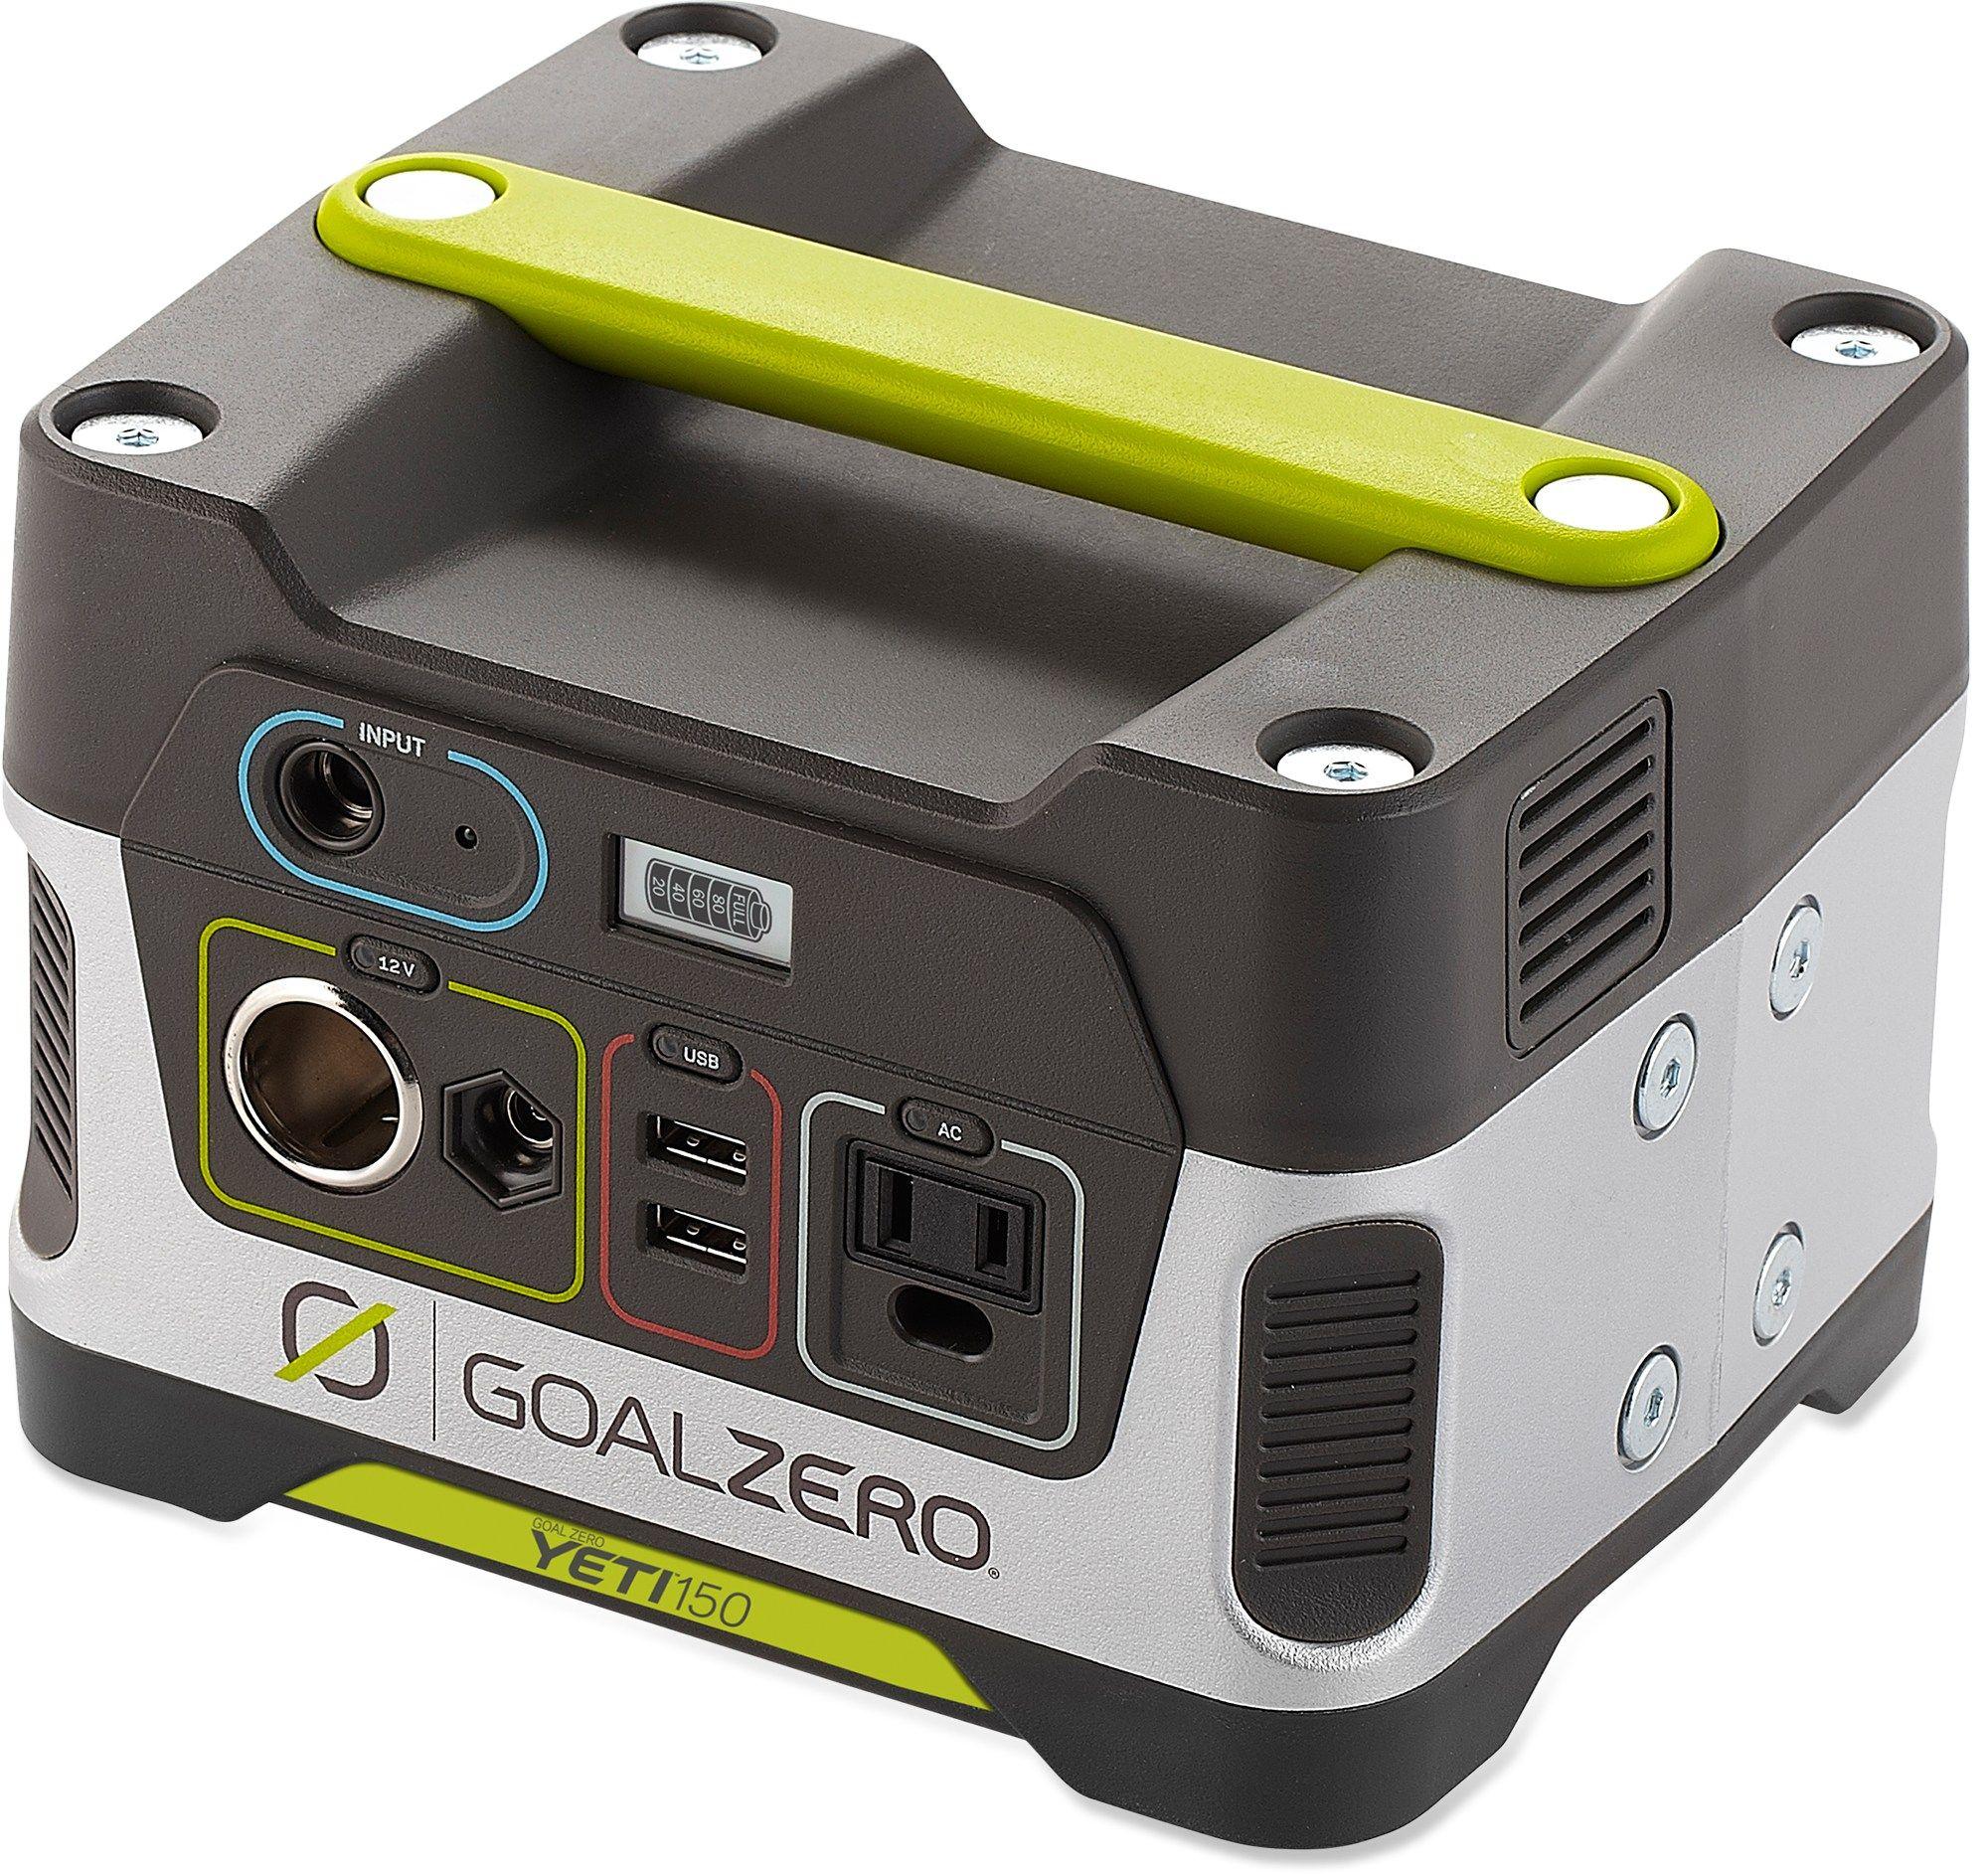 Goal Zero Yeti 150 Portable Power Generator Rei Co Op Portable Solar Generator Portable Power Generator Solar Generator